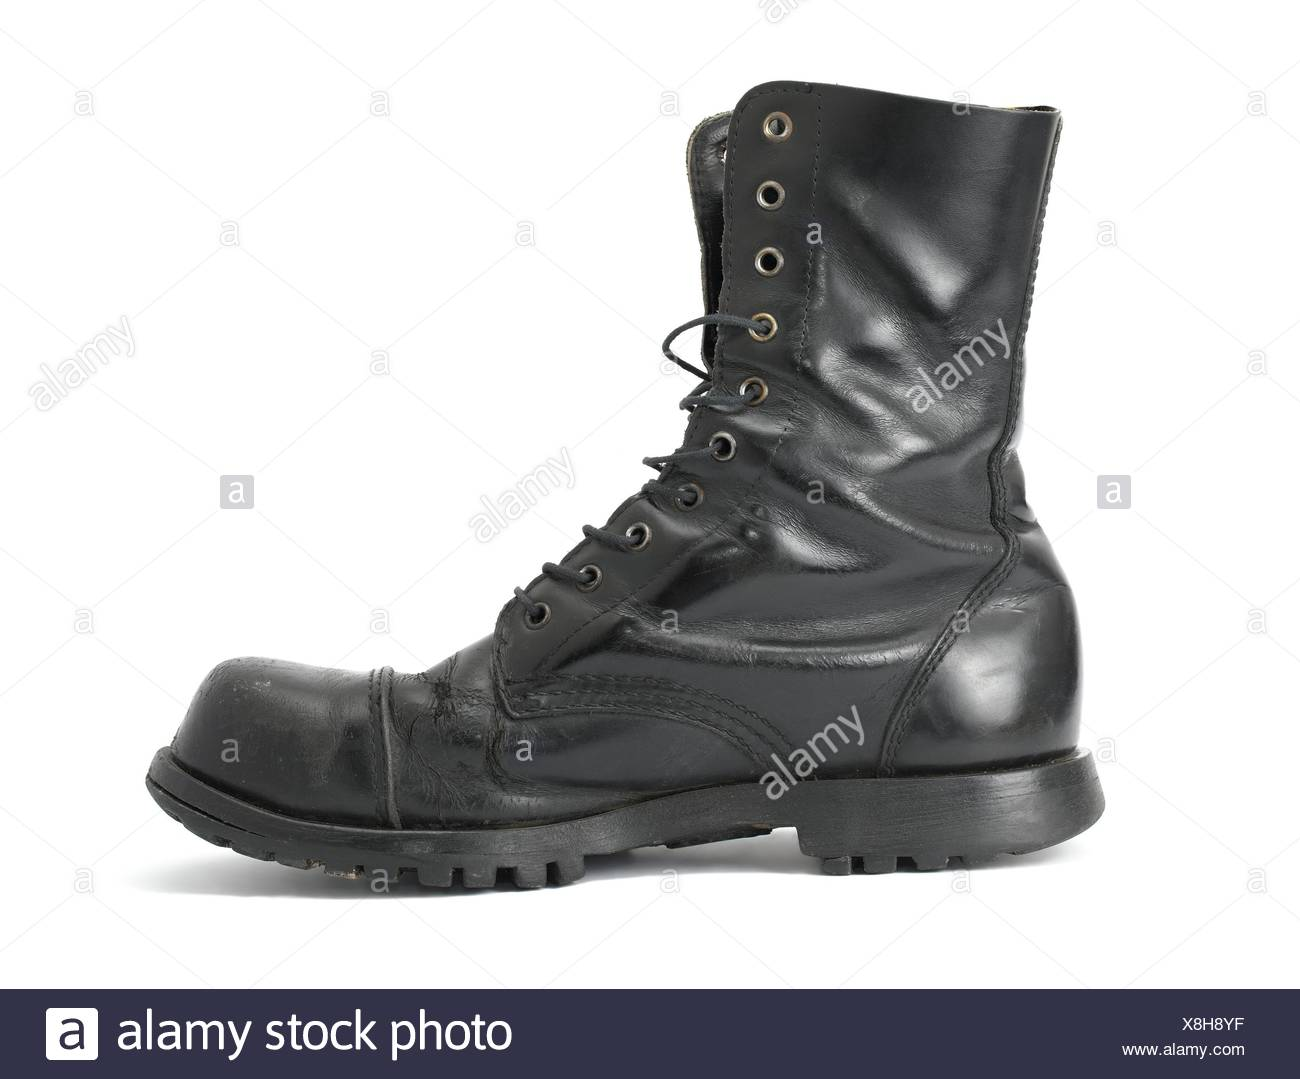 Photosamp; Alamy Cap Steel Images Shoes ED2HI9